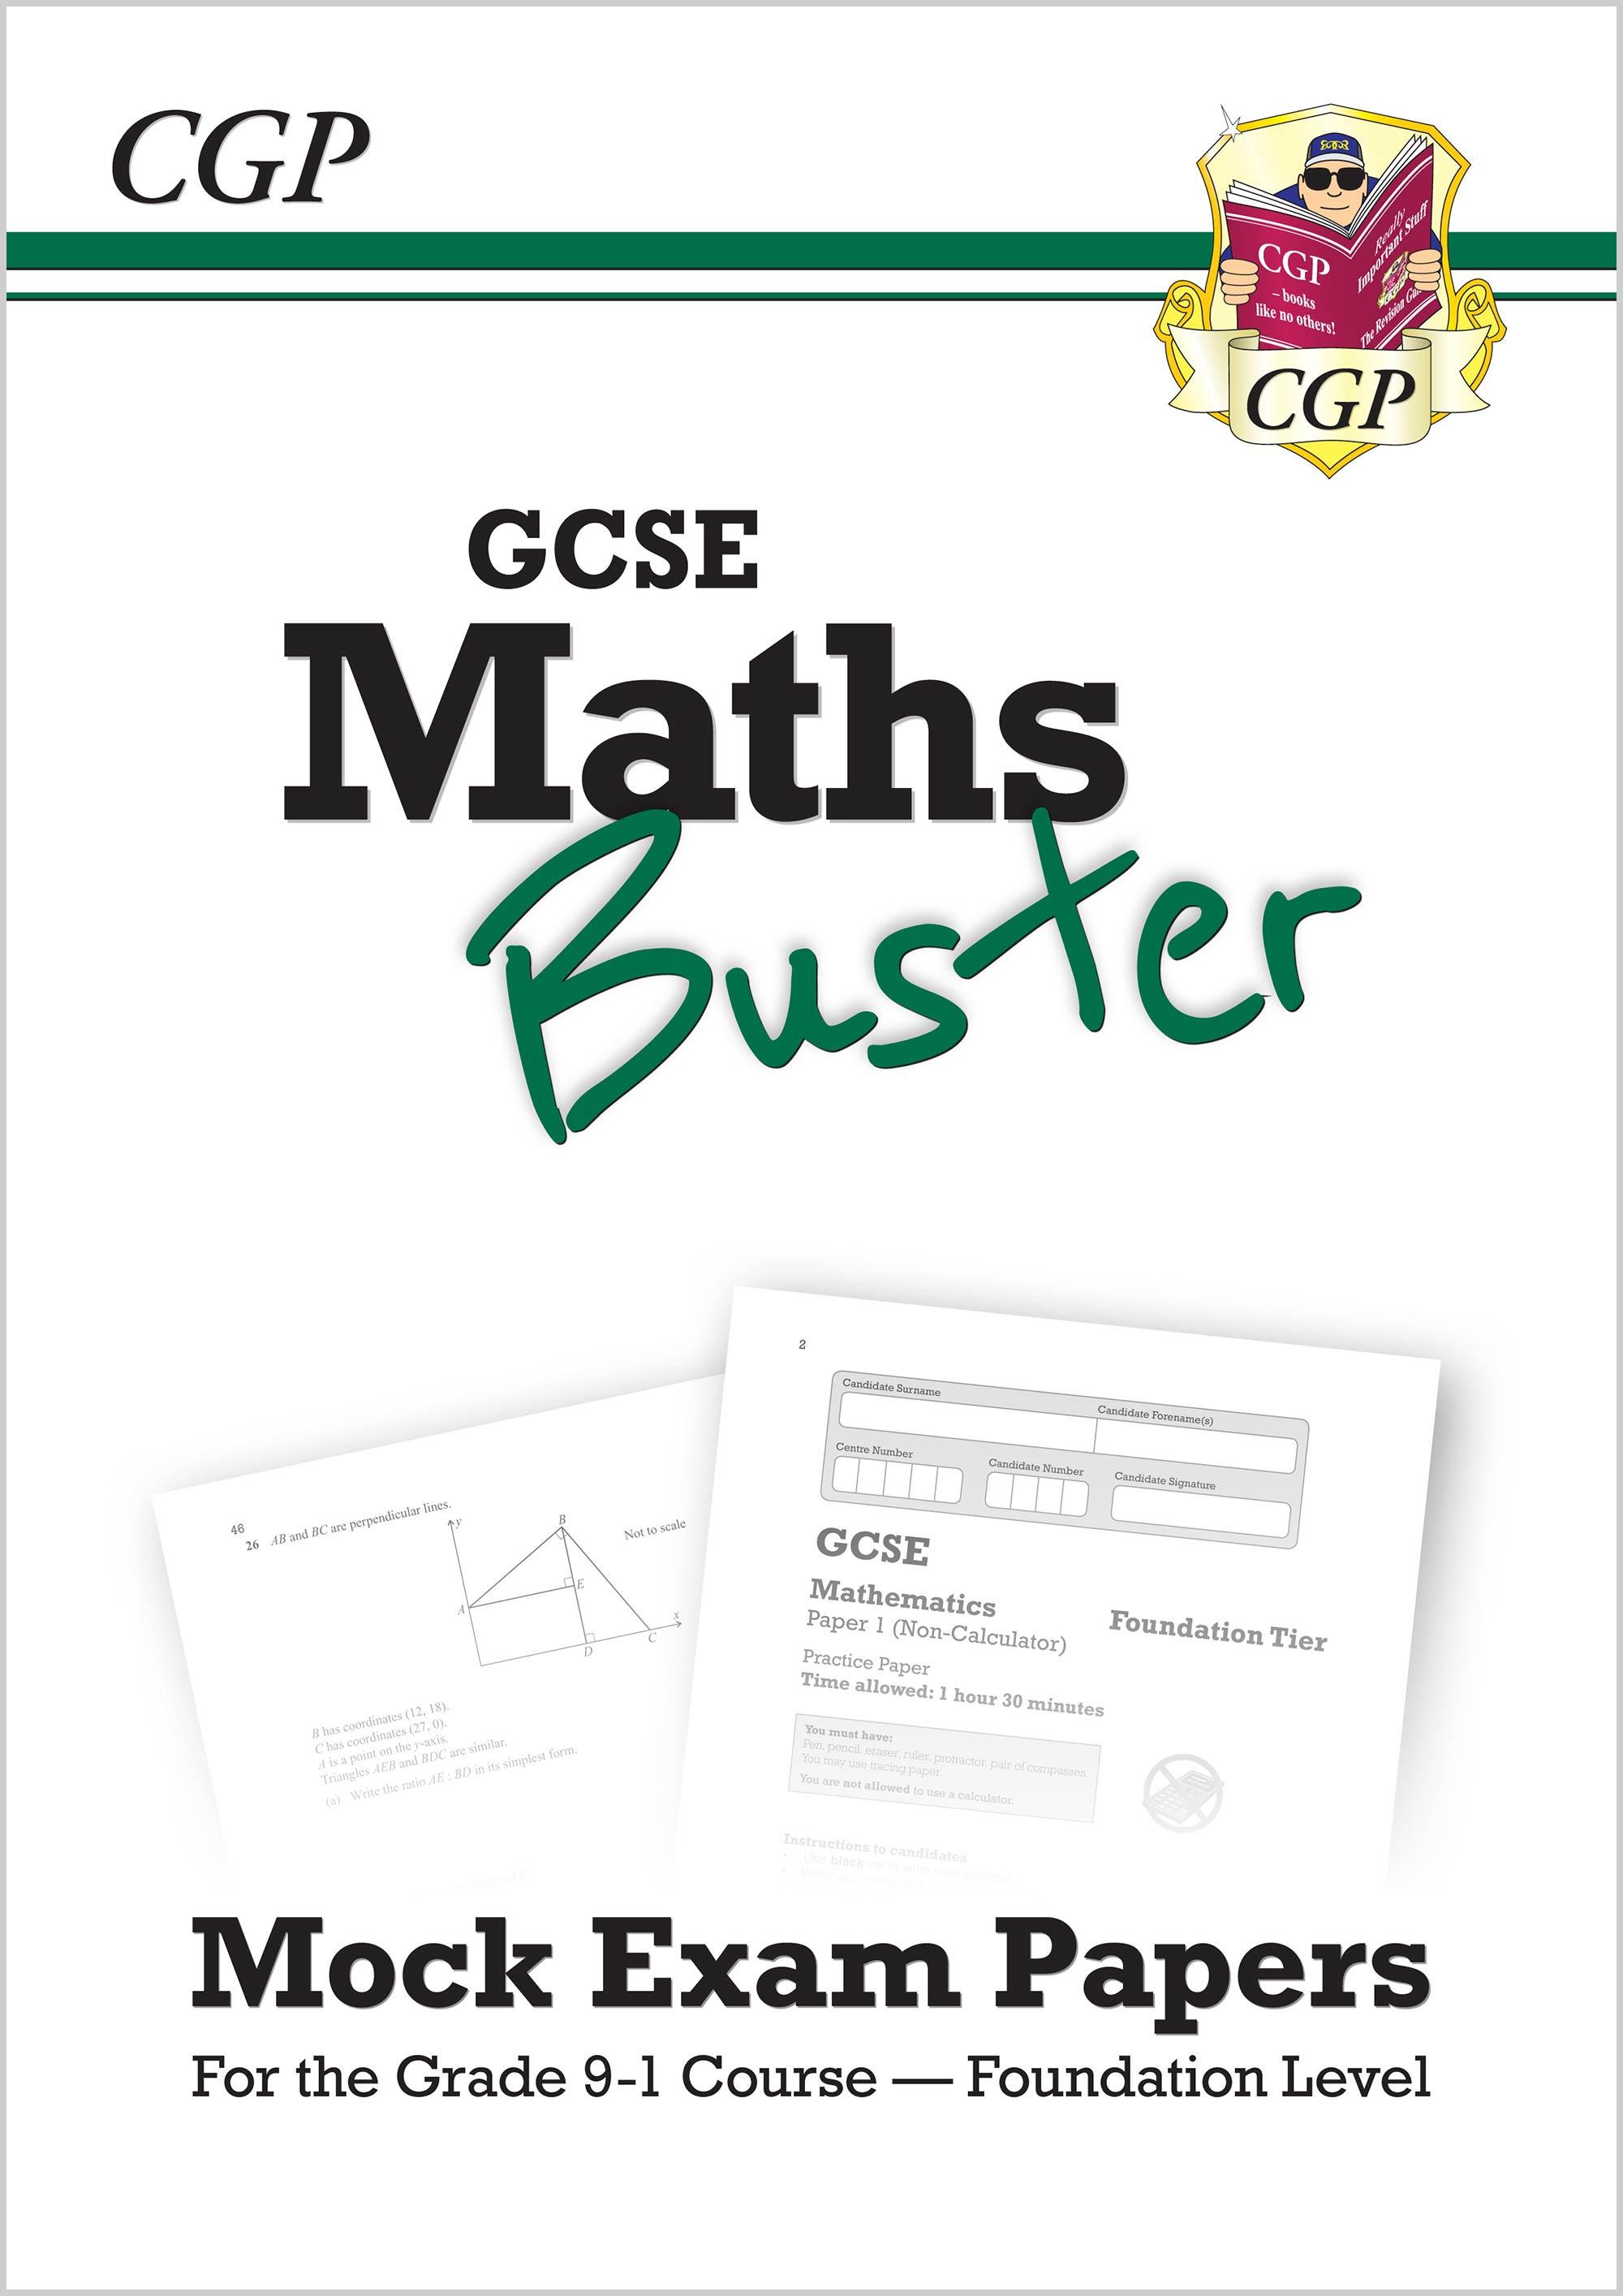 MathsBuster: GCSE Maths Mock Exam Paper Book (Grade 9-1 Course) - Foundation